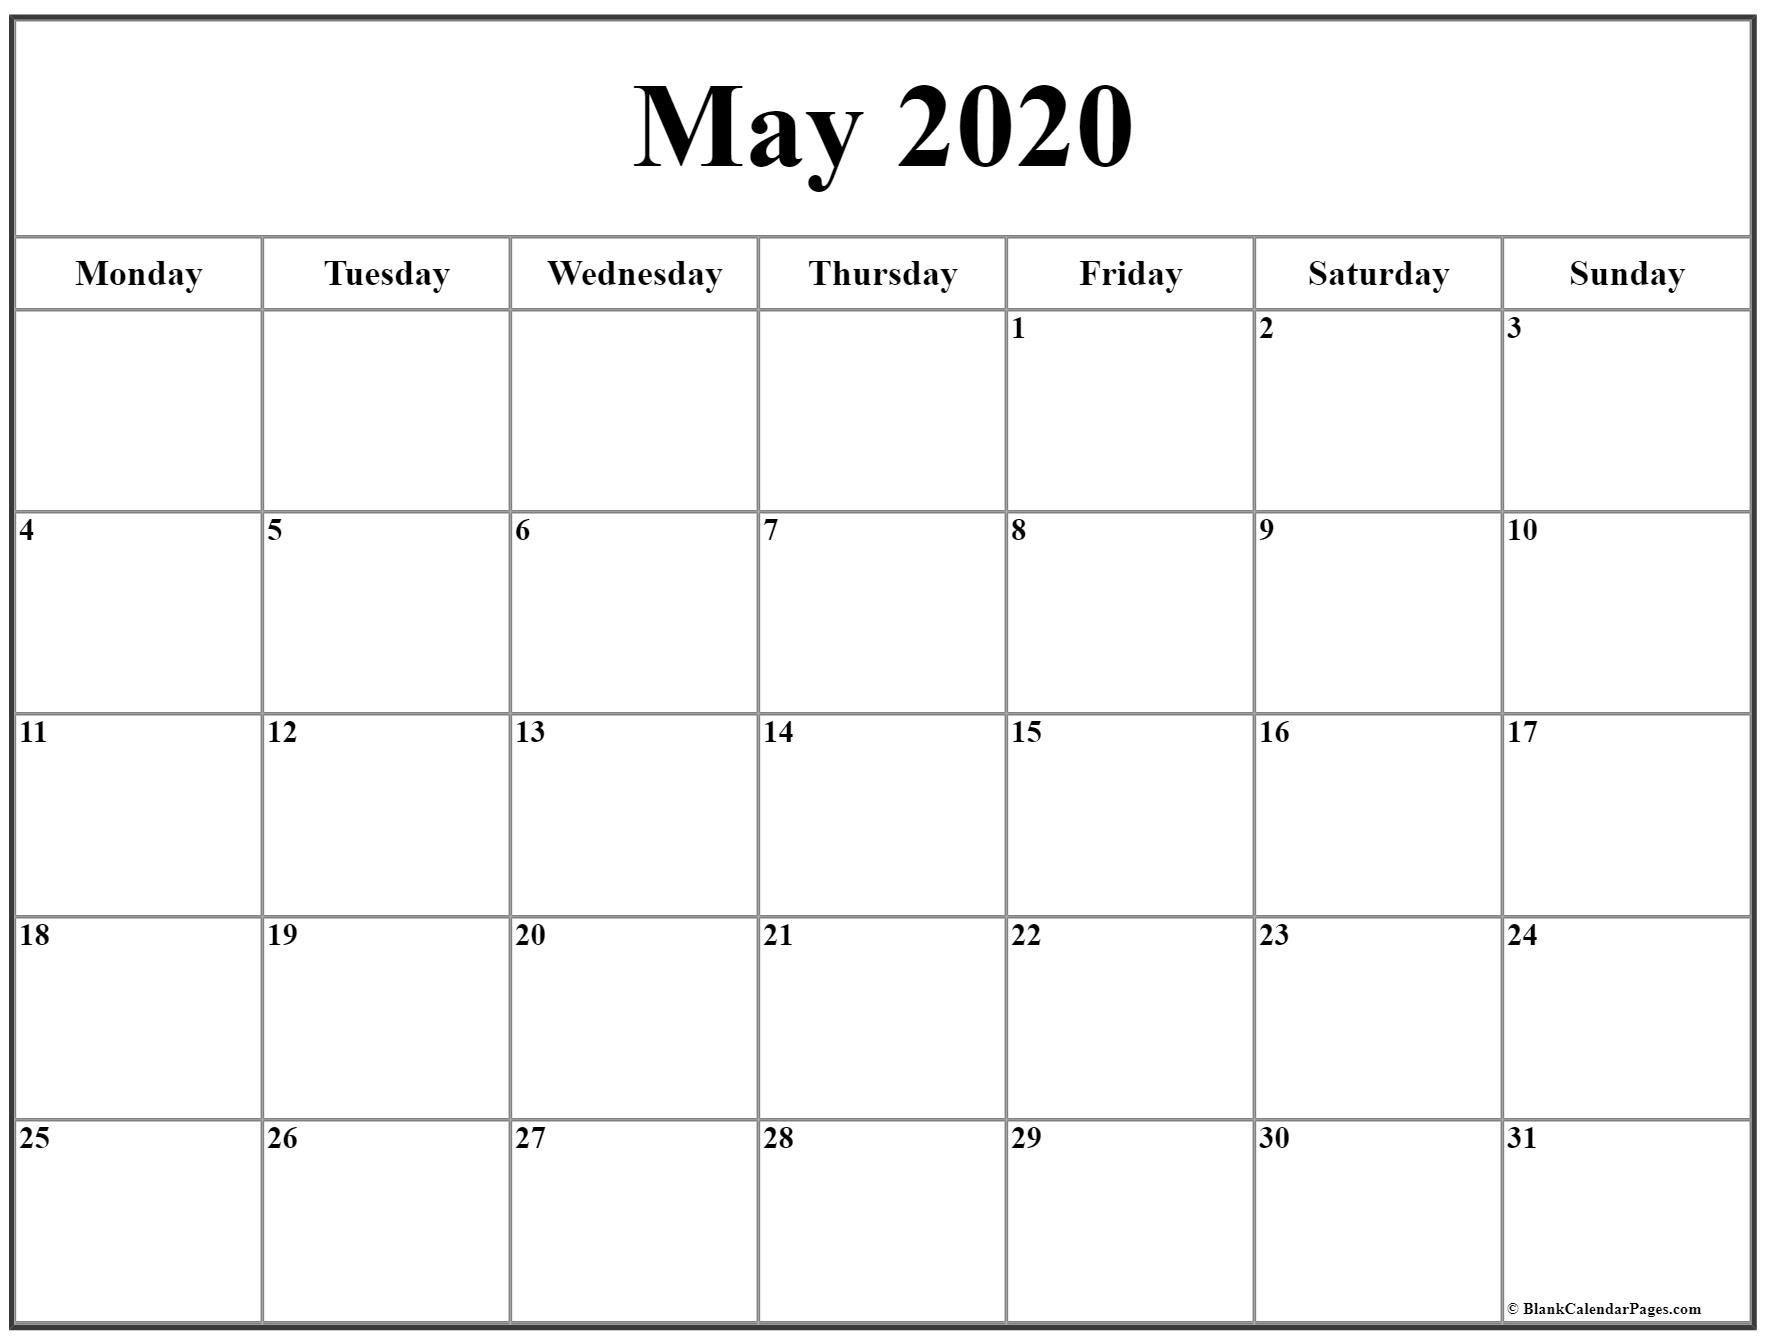 Free Printable Work Schedule Blank Schedules Calendar Weekly Planner Catch Weekly Calendar Template Weekly Calendar Planner Weekly Calendar Printable